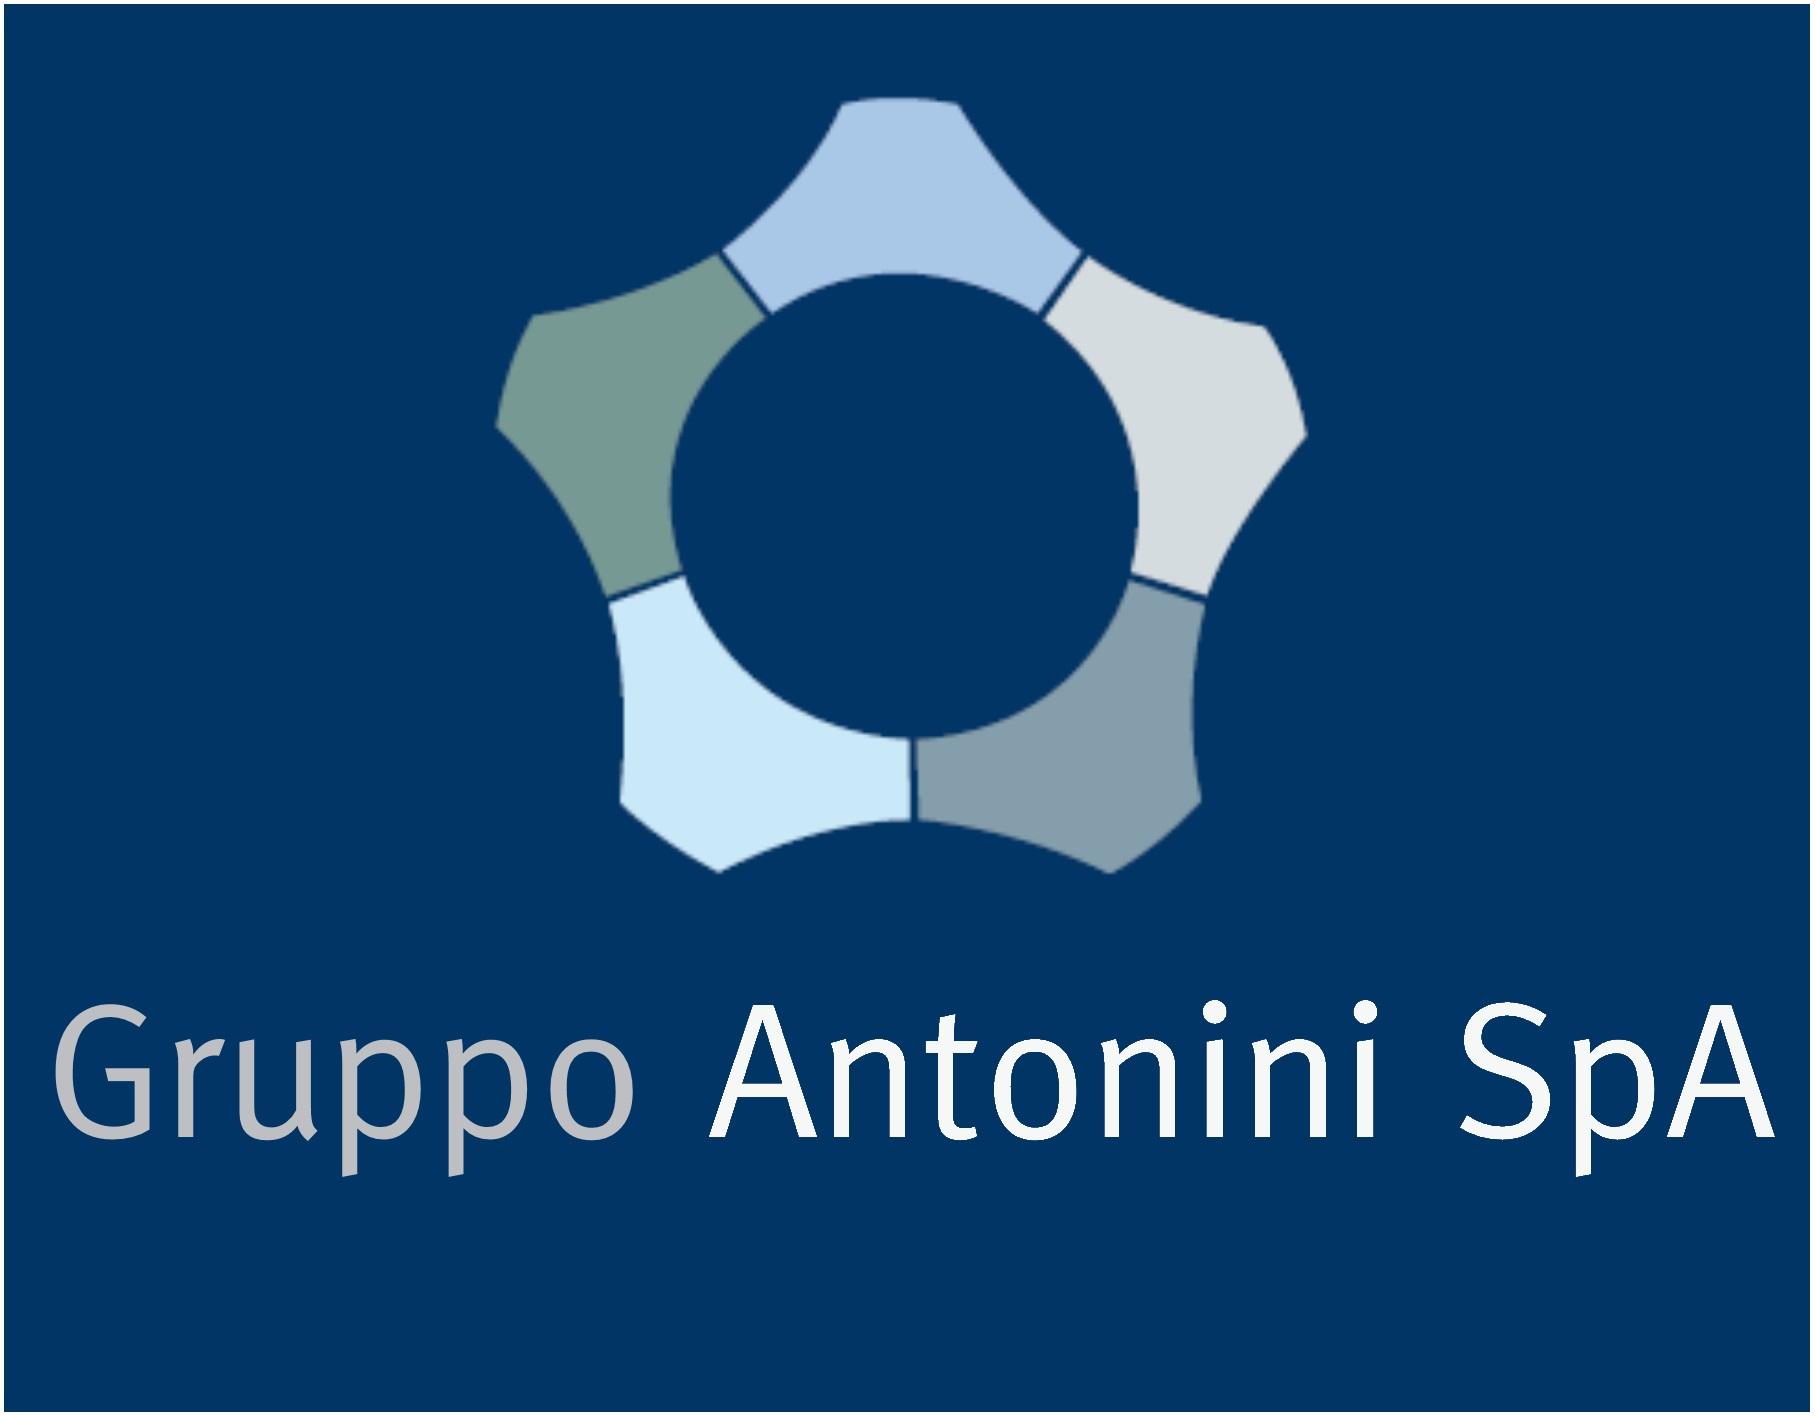 Gruppo Antonini SpA